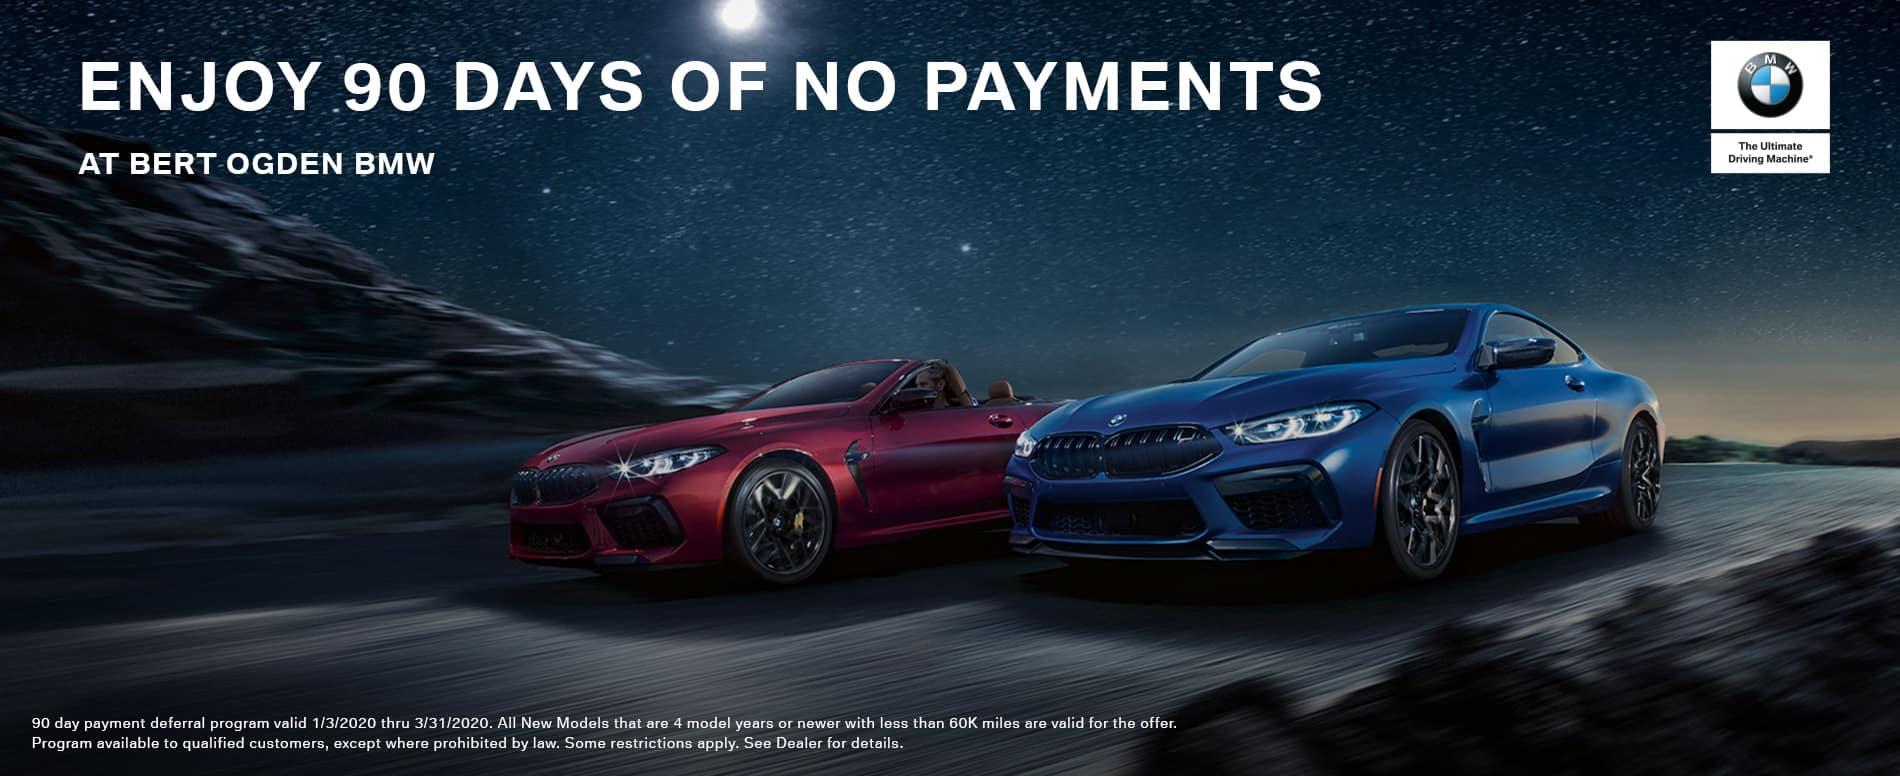 90 Days of No Payments at Bert Ogden BMW in McAllen, TX